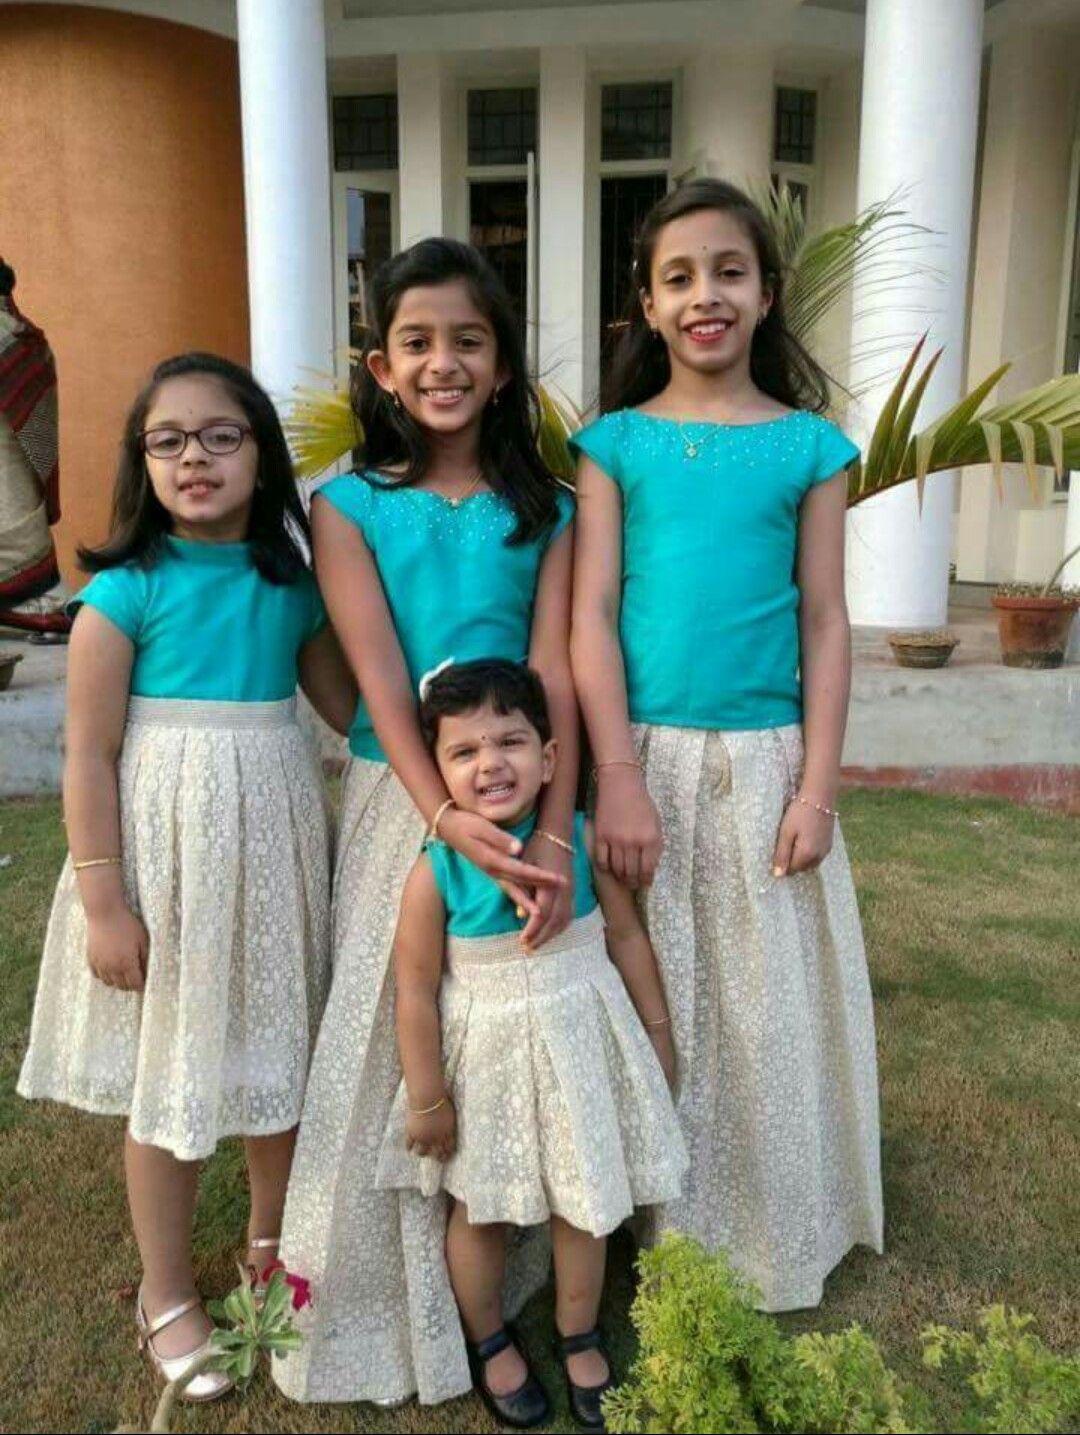 Pin de Vaishi Pradheep en Baby dress | Pinterest | Vestiditos